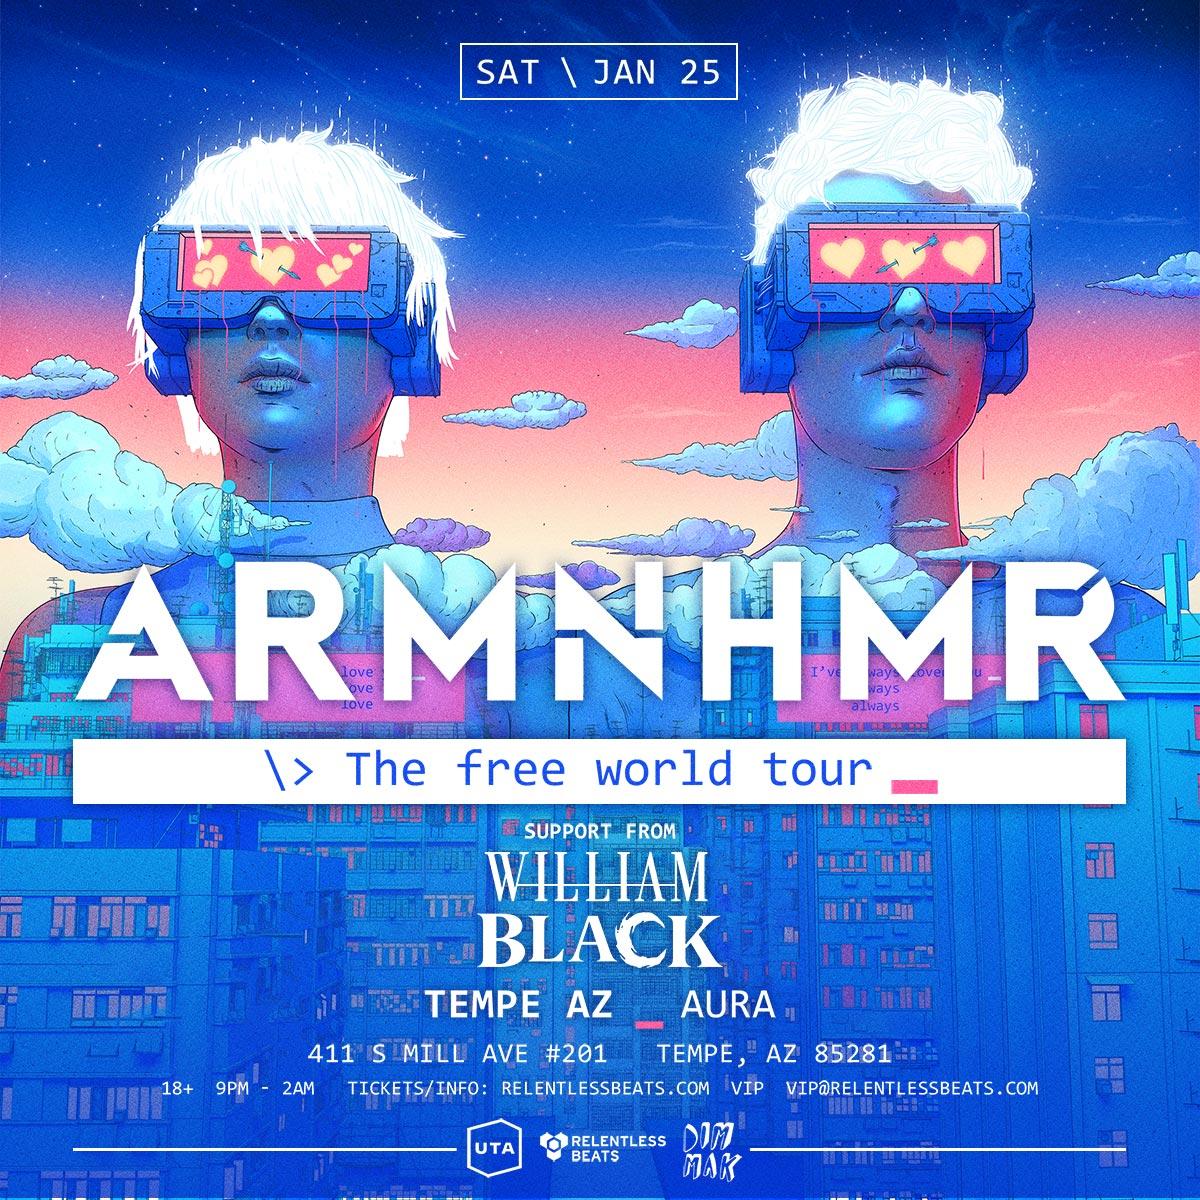 Flyer for ARMNHMR